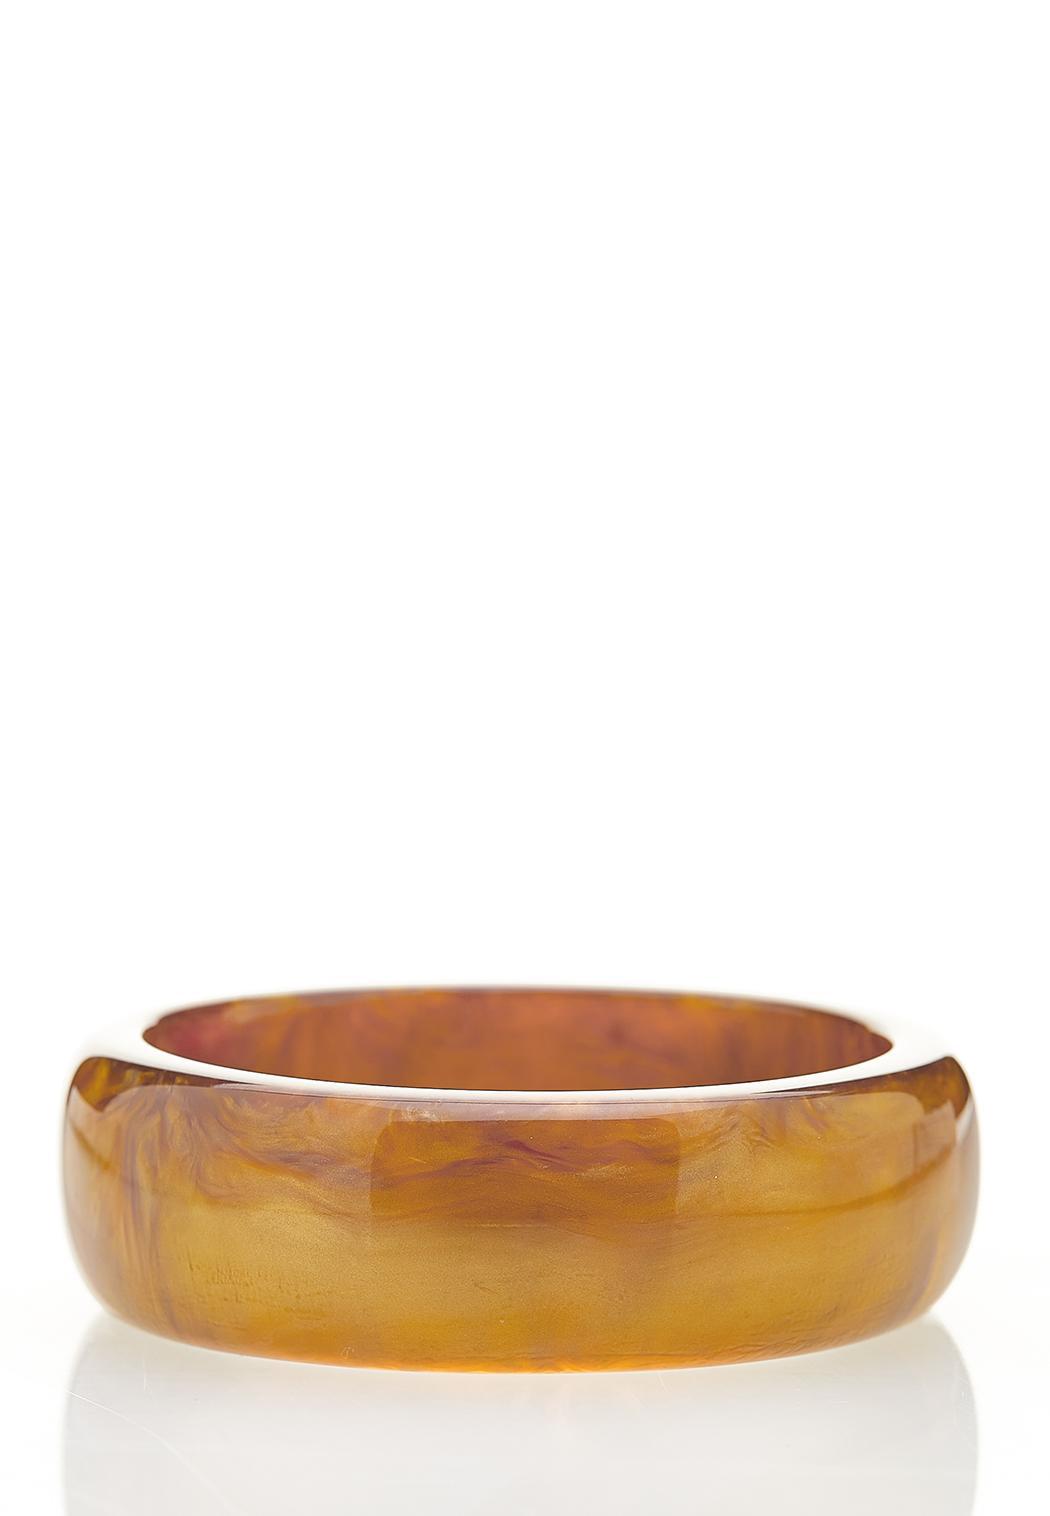 XL Gold Resin Bangle Bracelet